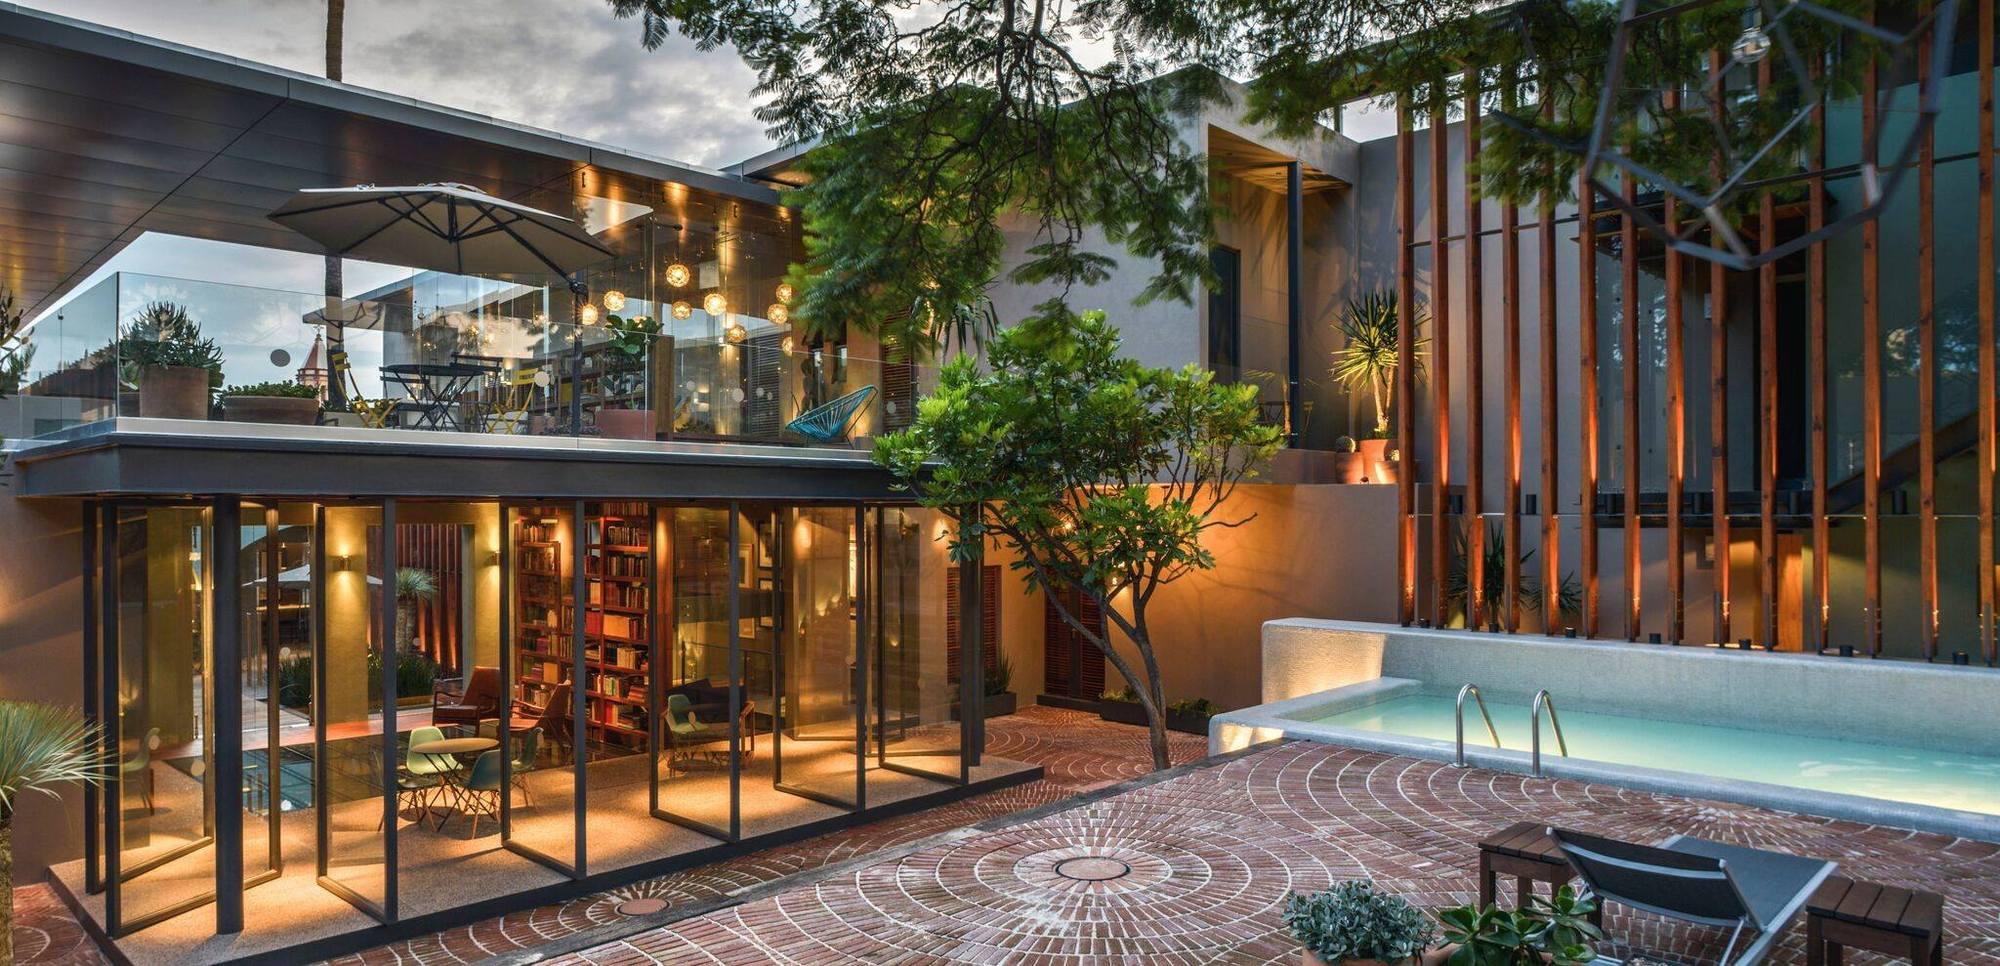 Hotel criol miguel concha arquitectura archdaily m xico for Hoteles de diseno en paris